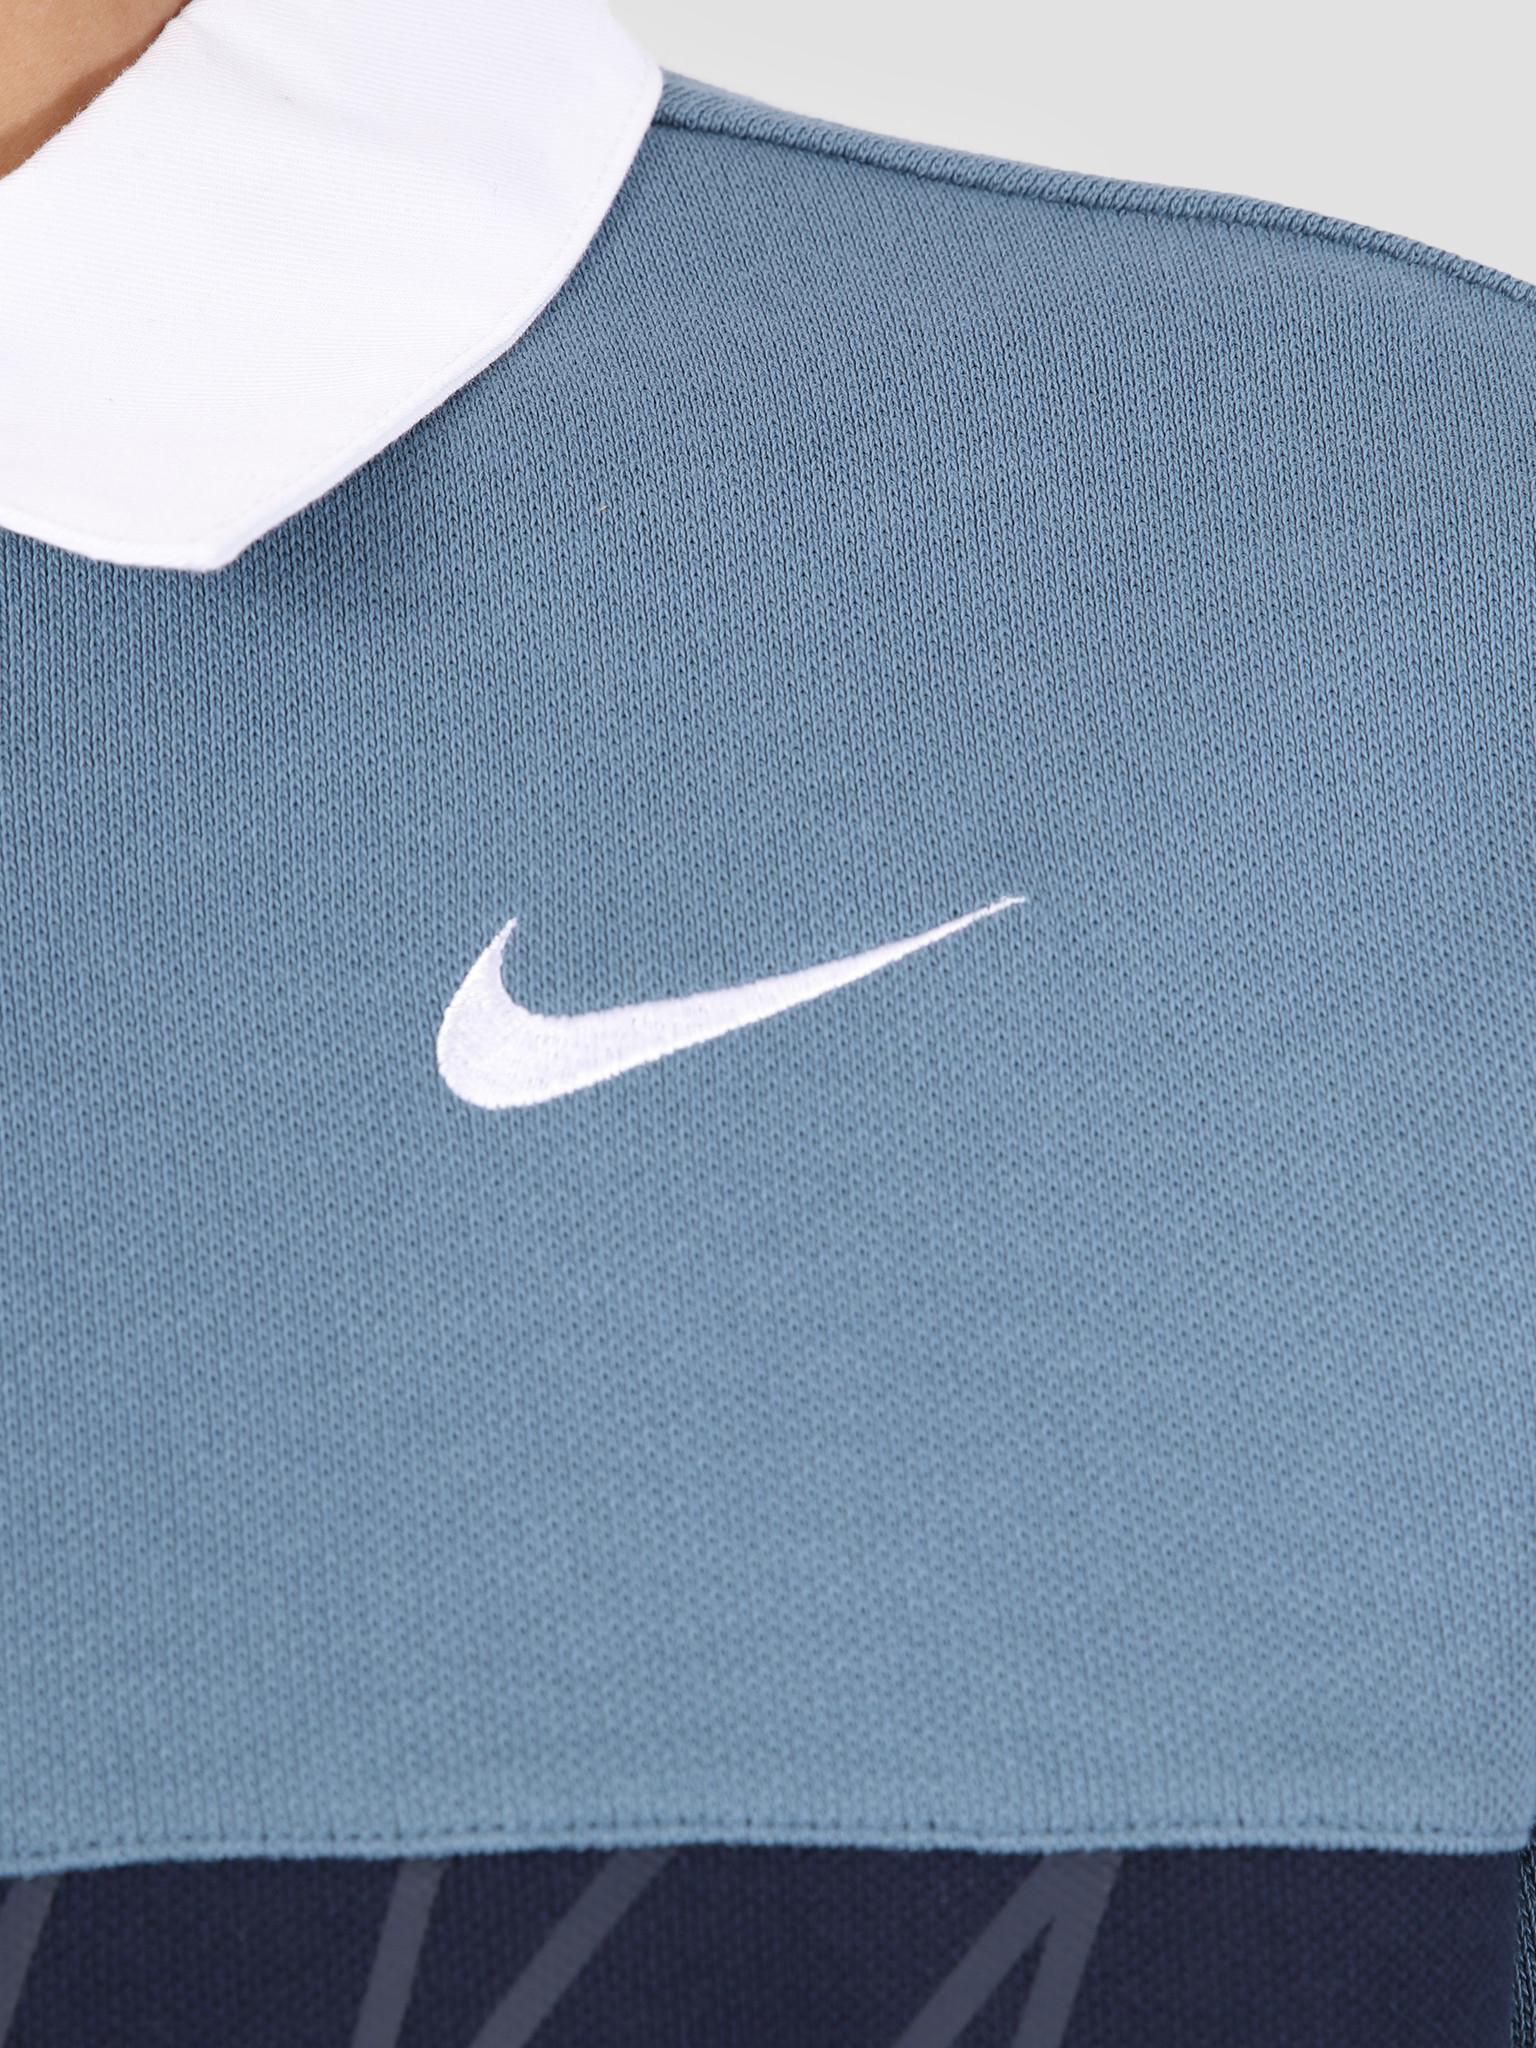 ea9b8ea7 Nike Nike SB Dry Polo Thunderstorm Obsidian White White 885847-418